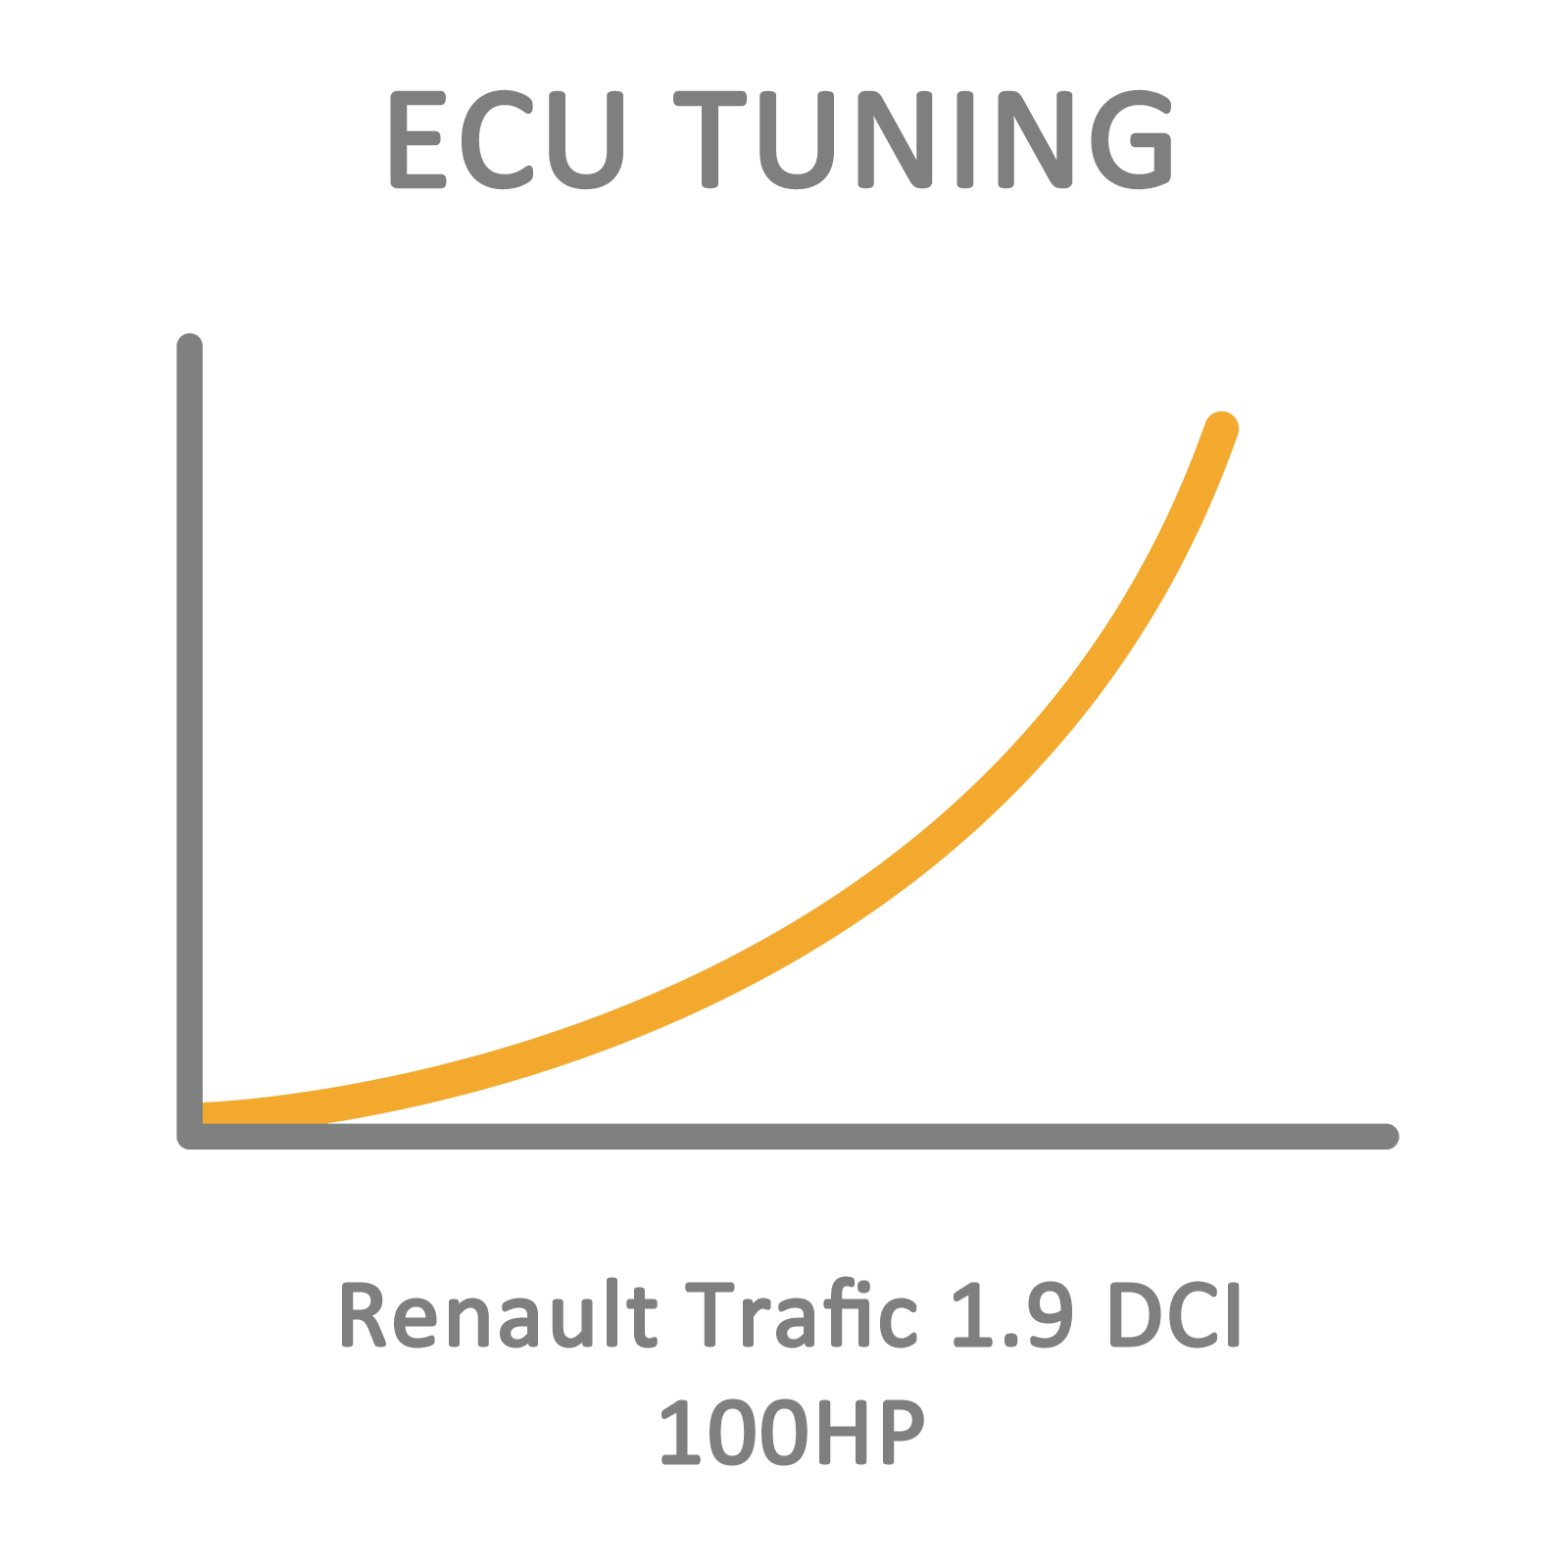 Renault Trafic 1.9 DCI 100HP ECU Tuning Remapping Programming